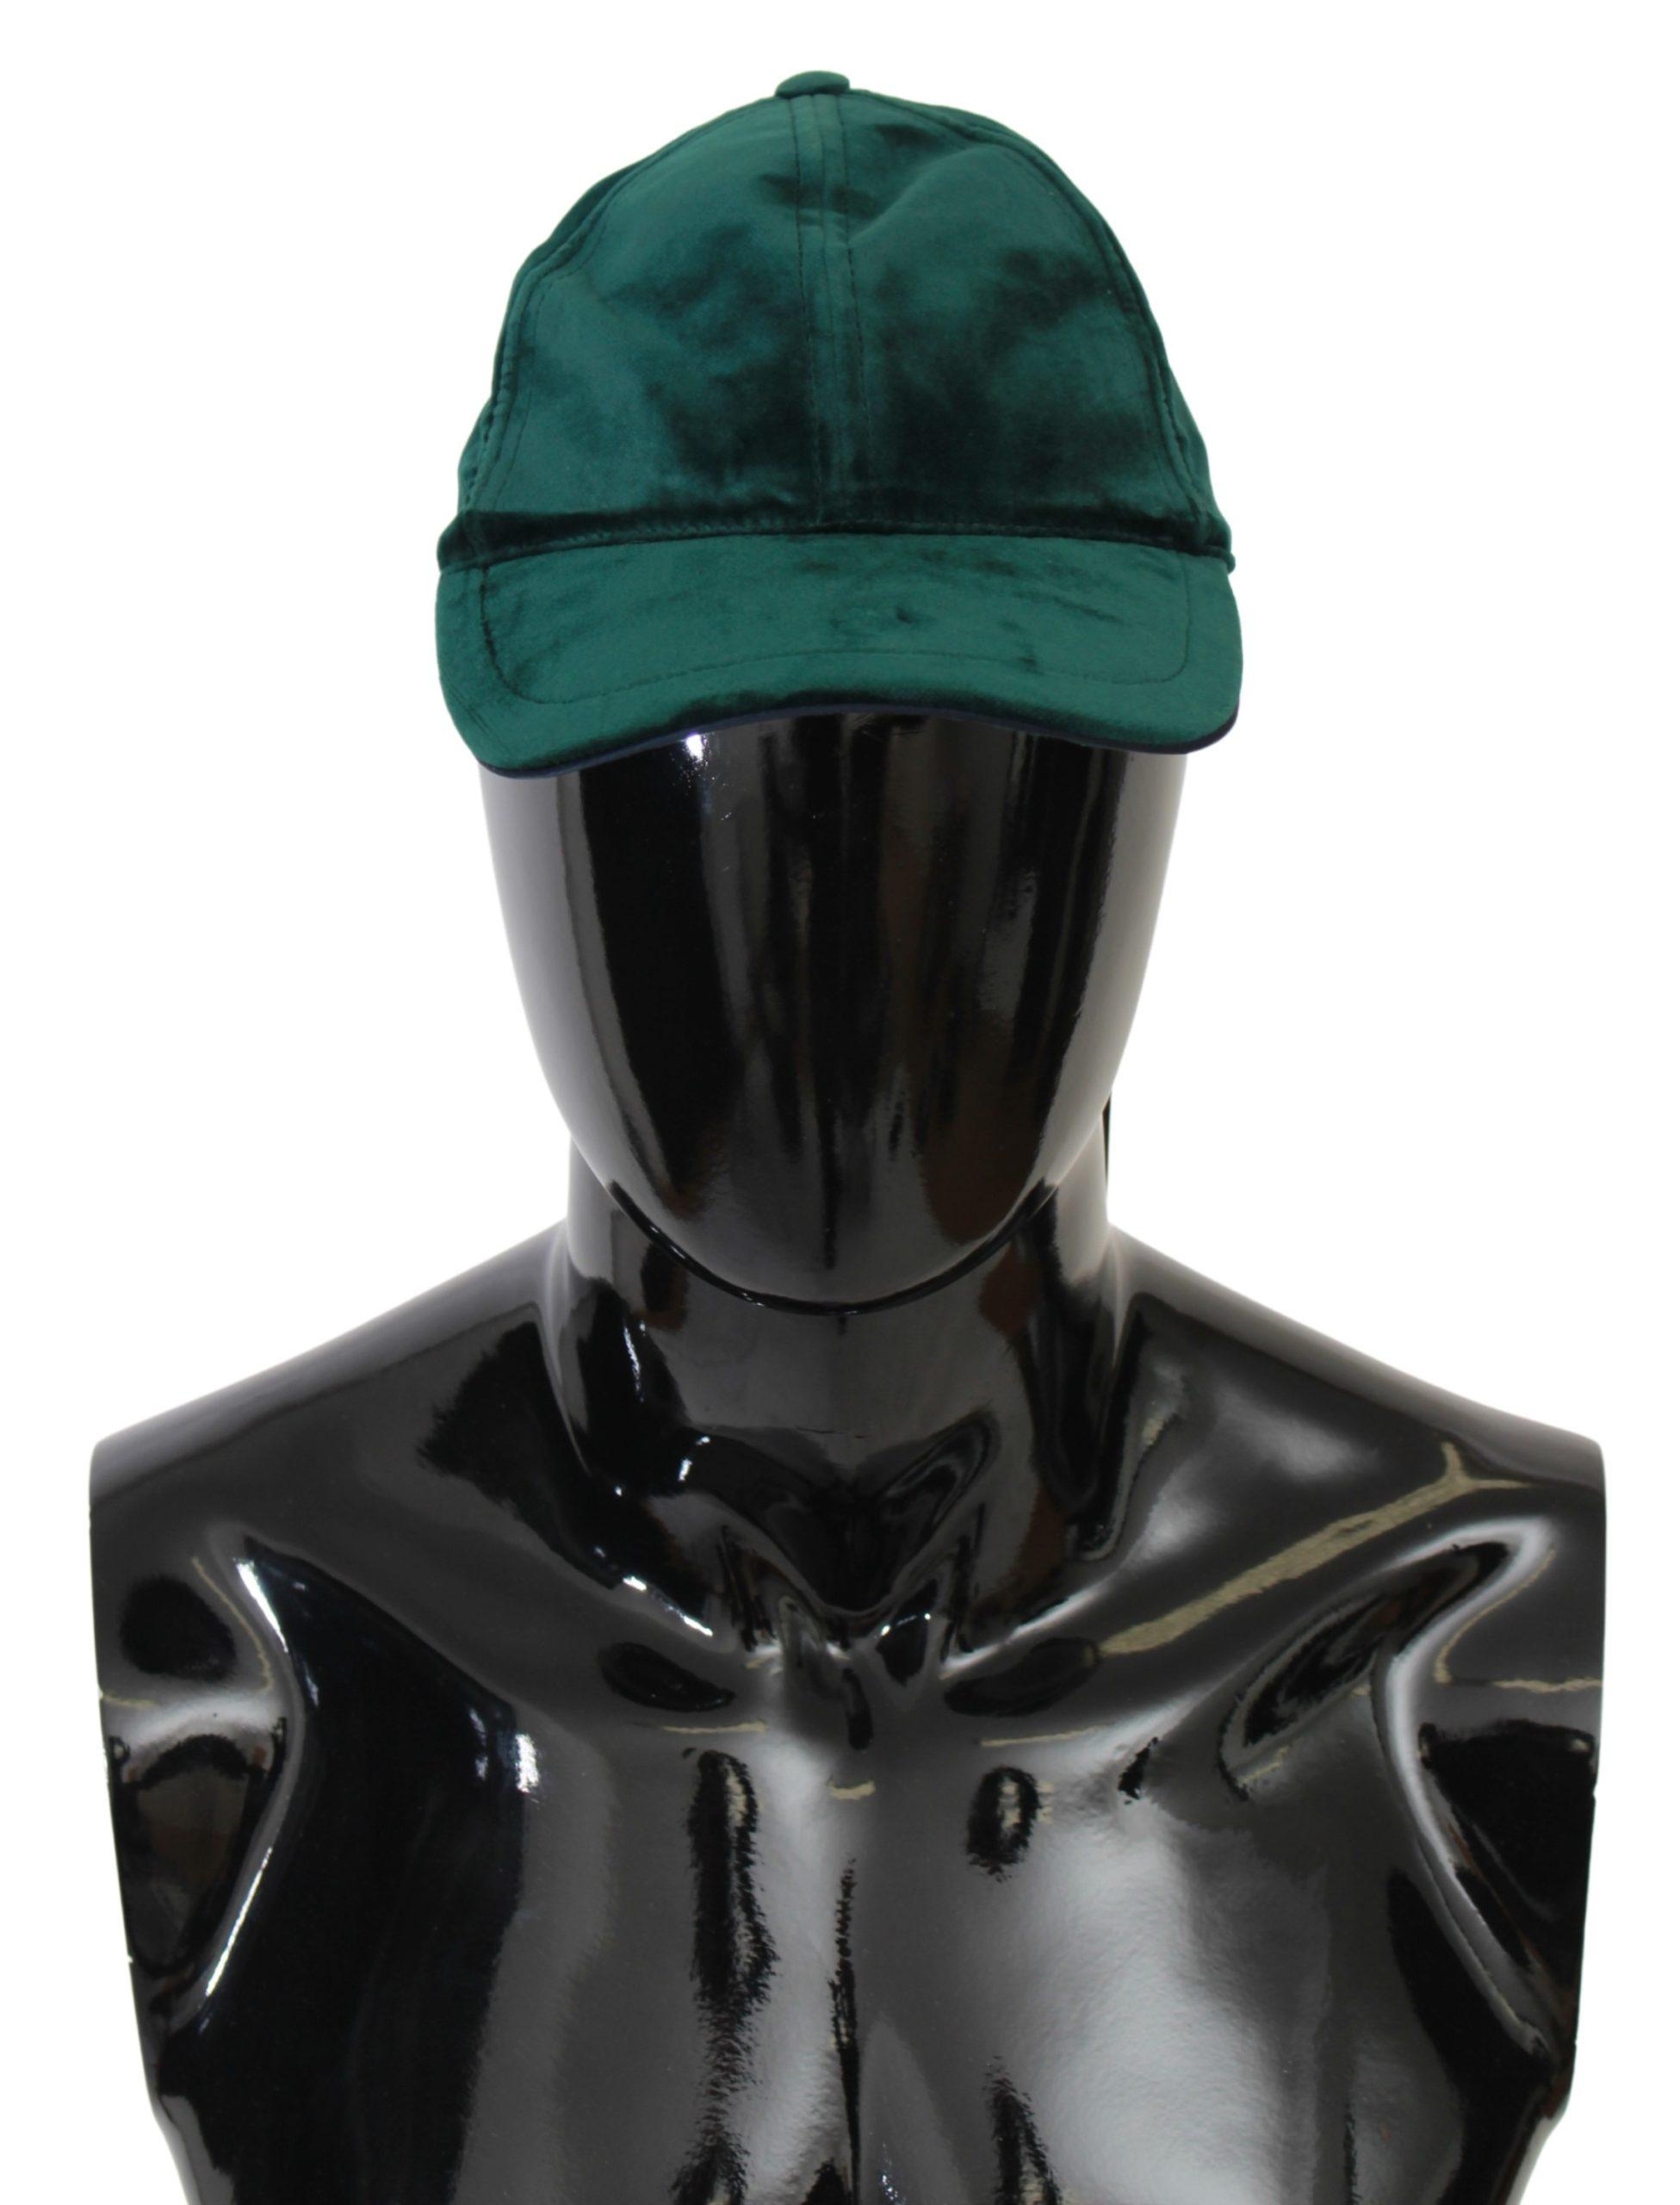 Dolce & Gabbana Men's Solid Baseball Cotton Cap Green HAT20035 - 57 cm|S